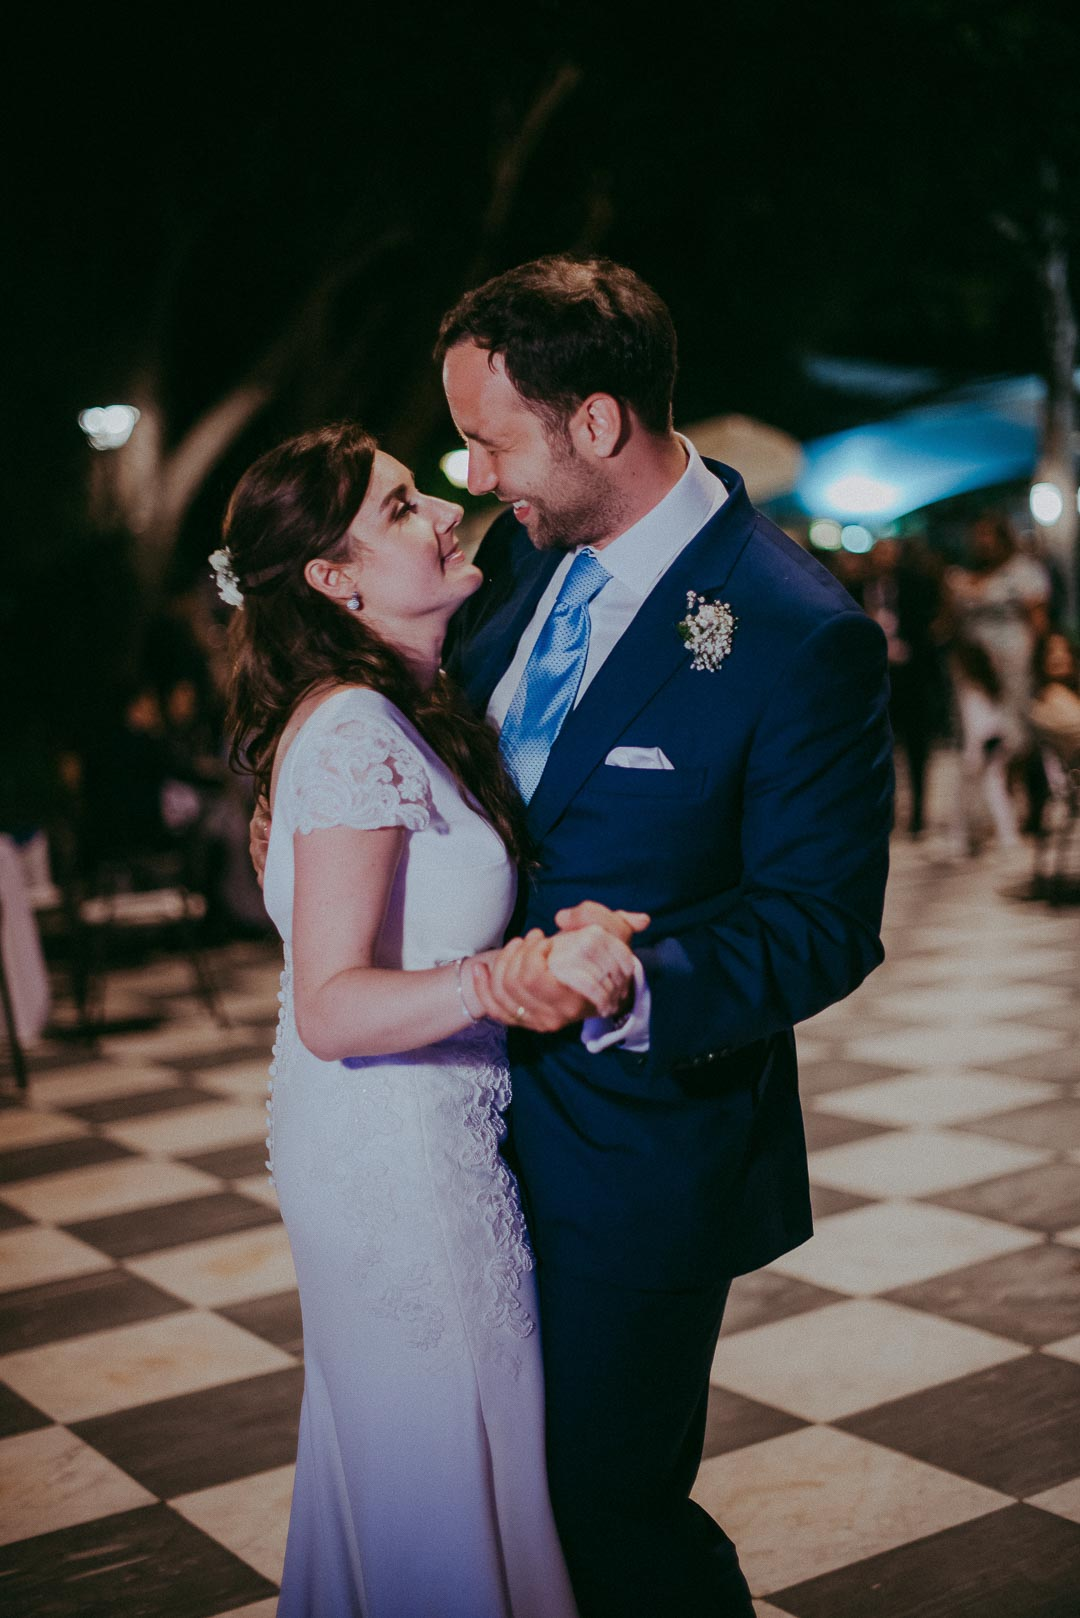 wedding-photographer-destination-fineart-bespoke-reportage-sorrento-parcodeiprincipi-vivianeizzo-spazio46-105